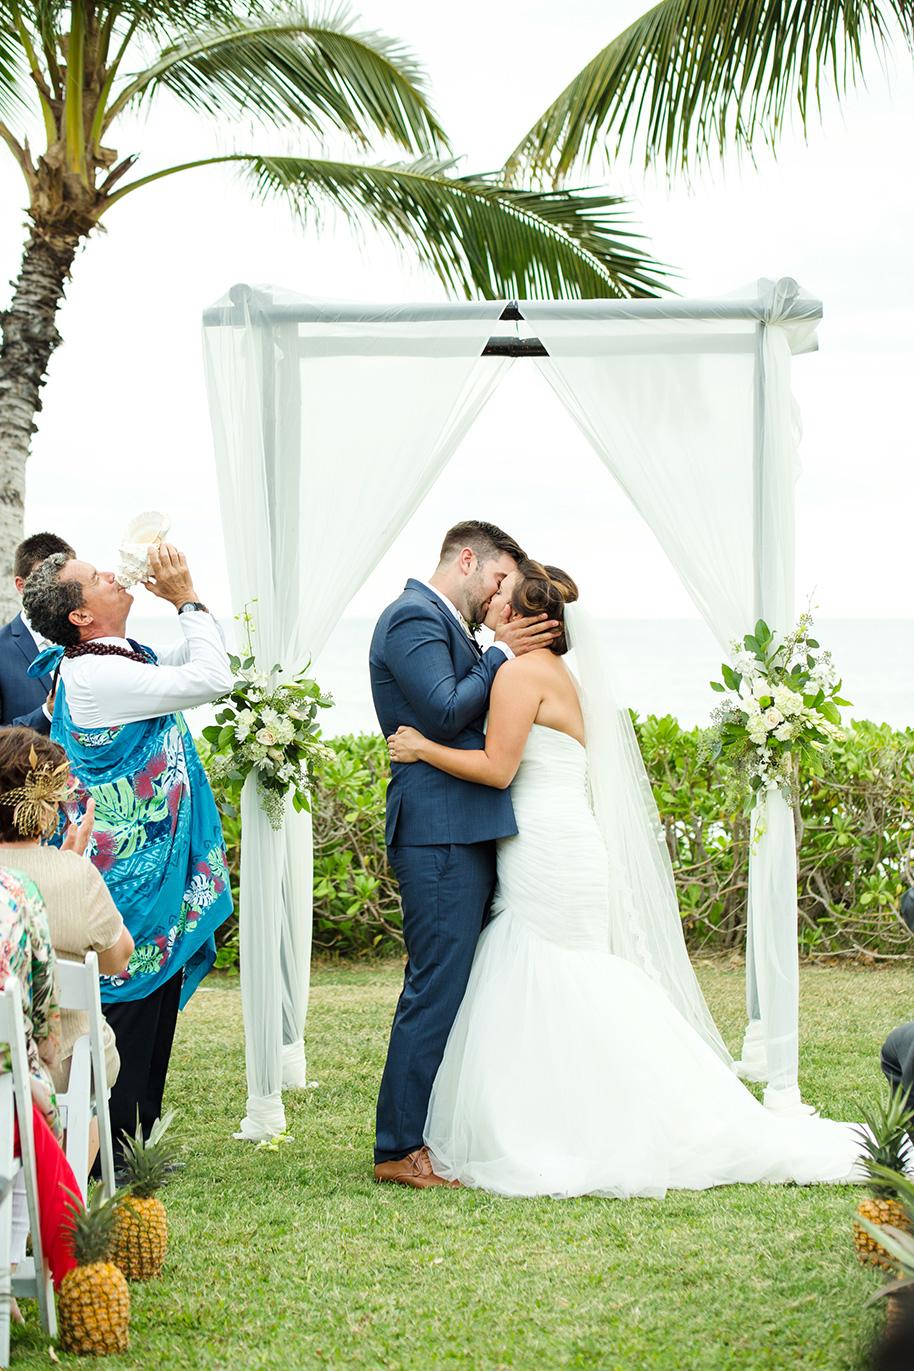 Paradise-Cove-Wedding-040816-26